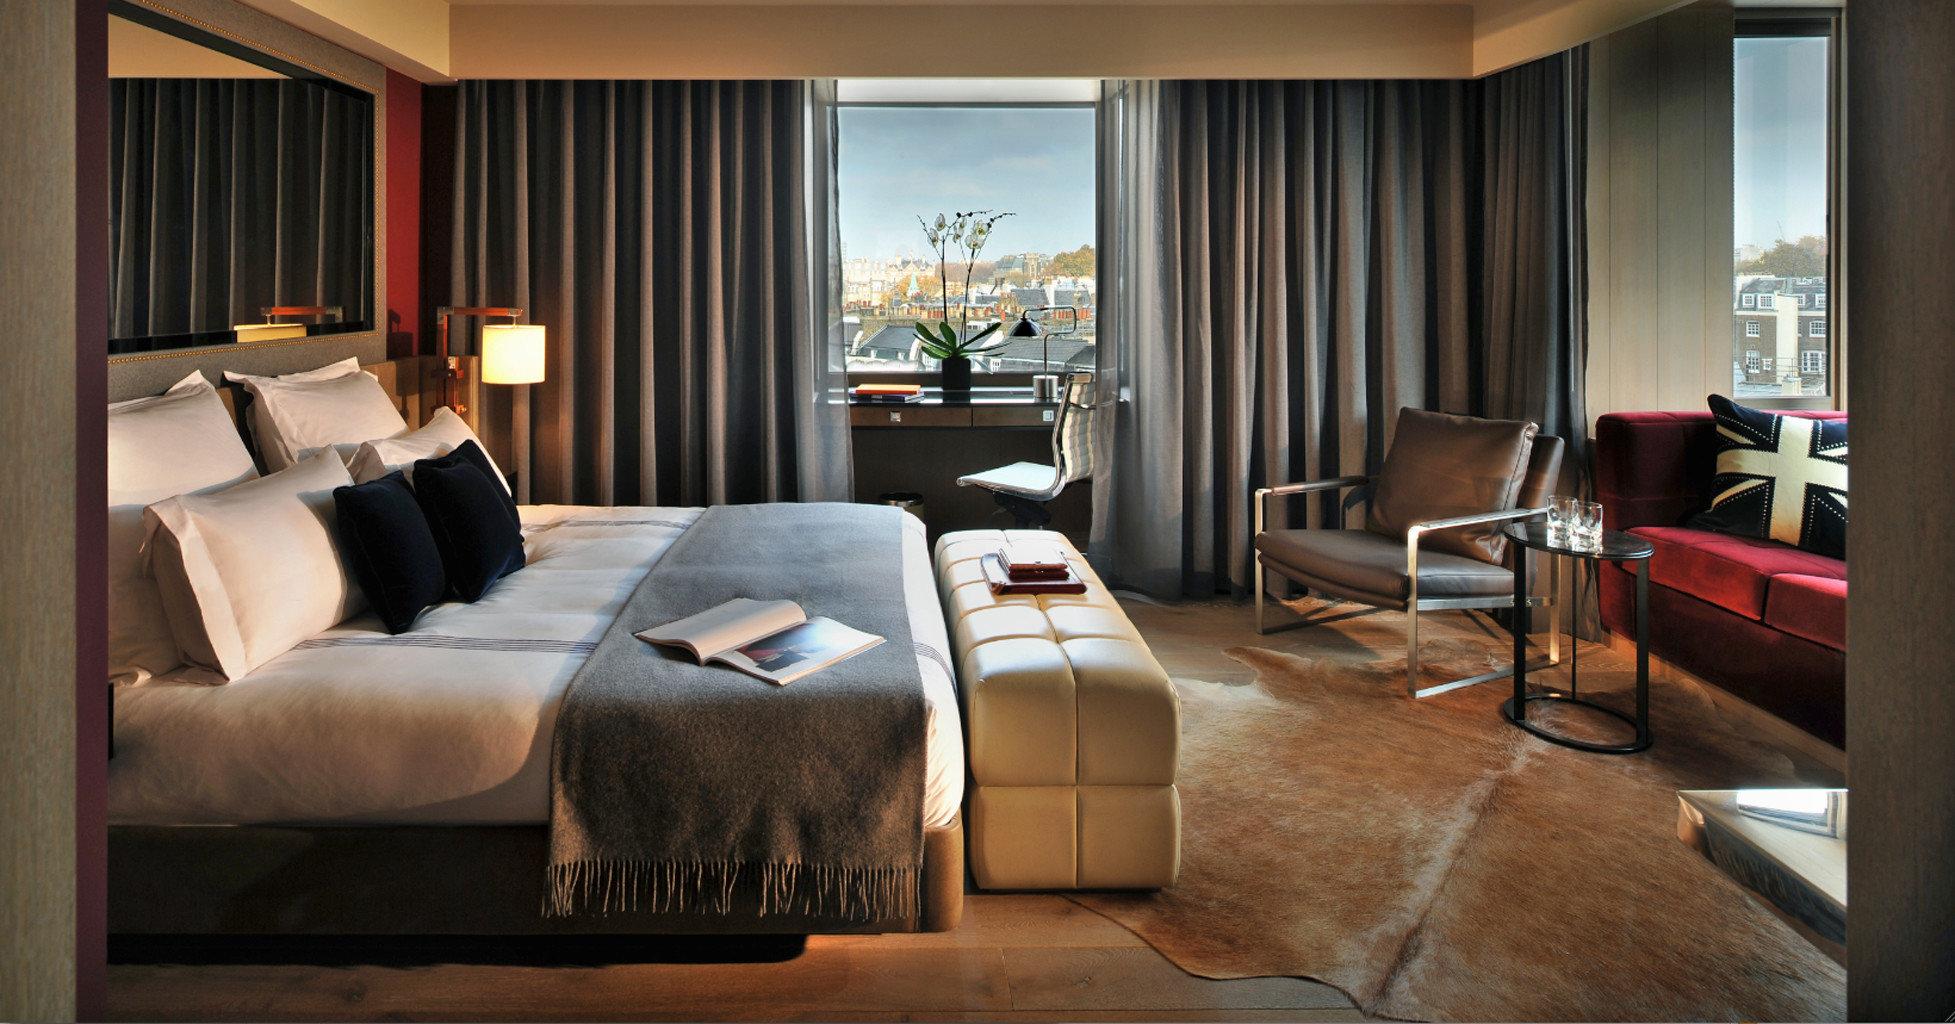 Bedroom Luxury Modern sofa property Suite living room home nice cottage condominium